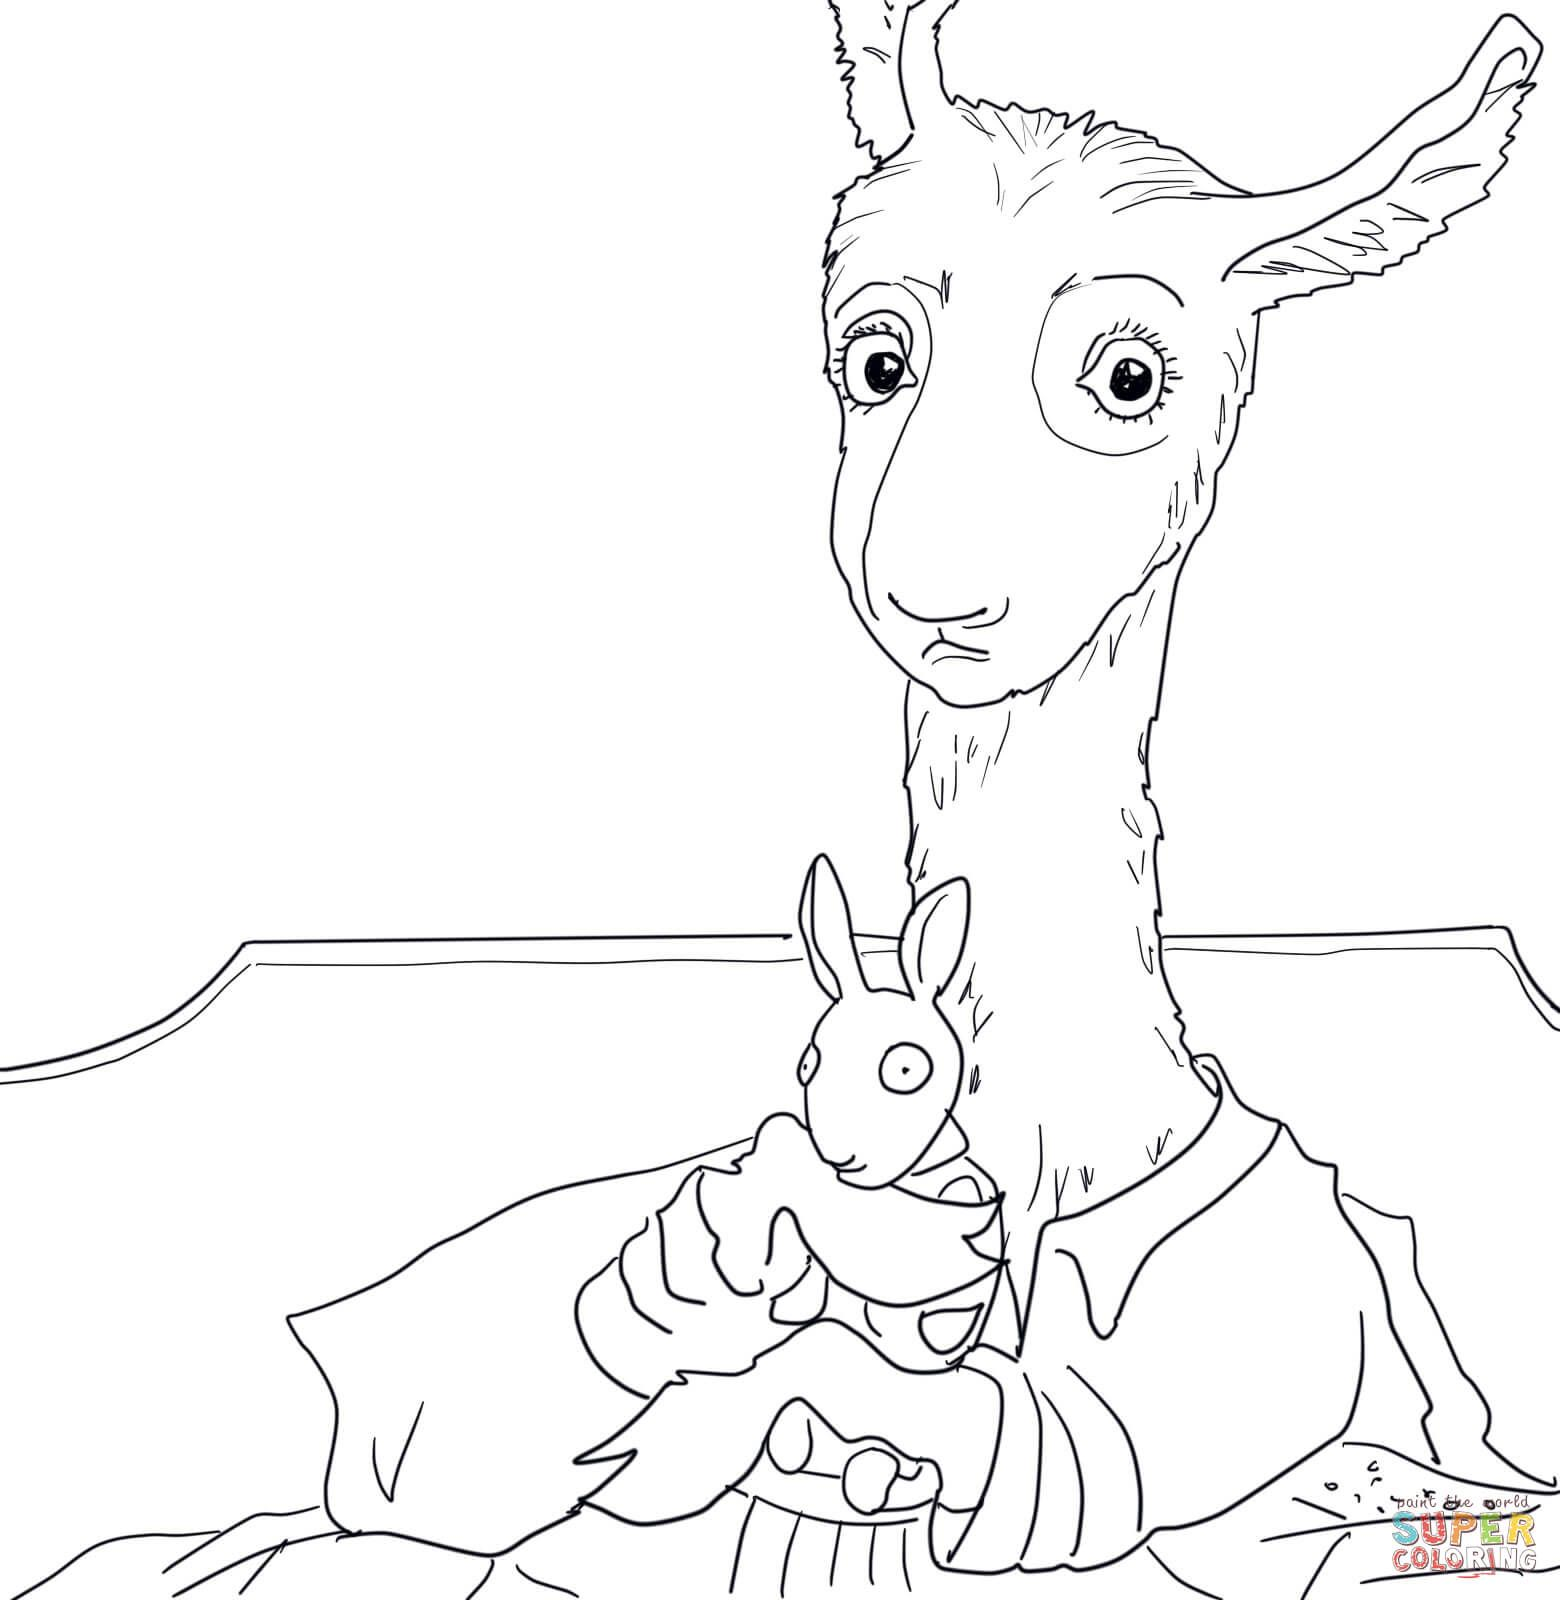 Http Coloringhome Com Coloring Page 1684674 Llama Llama Red